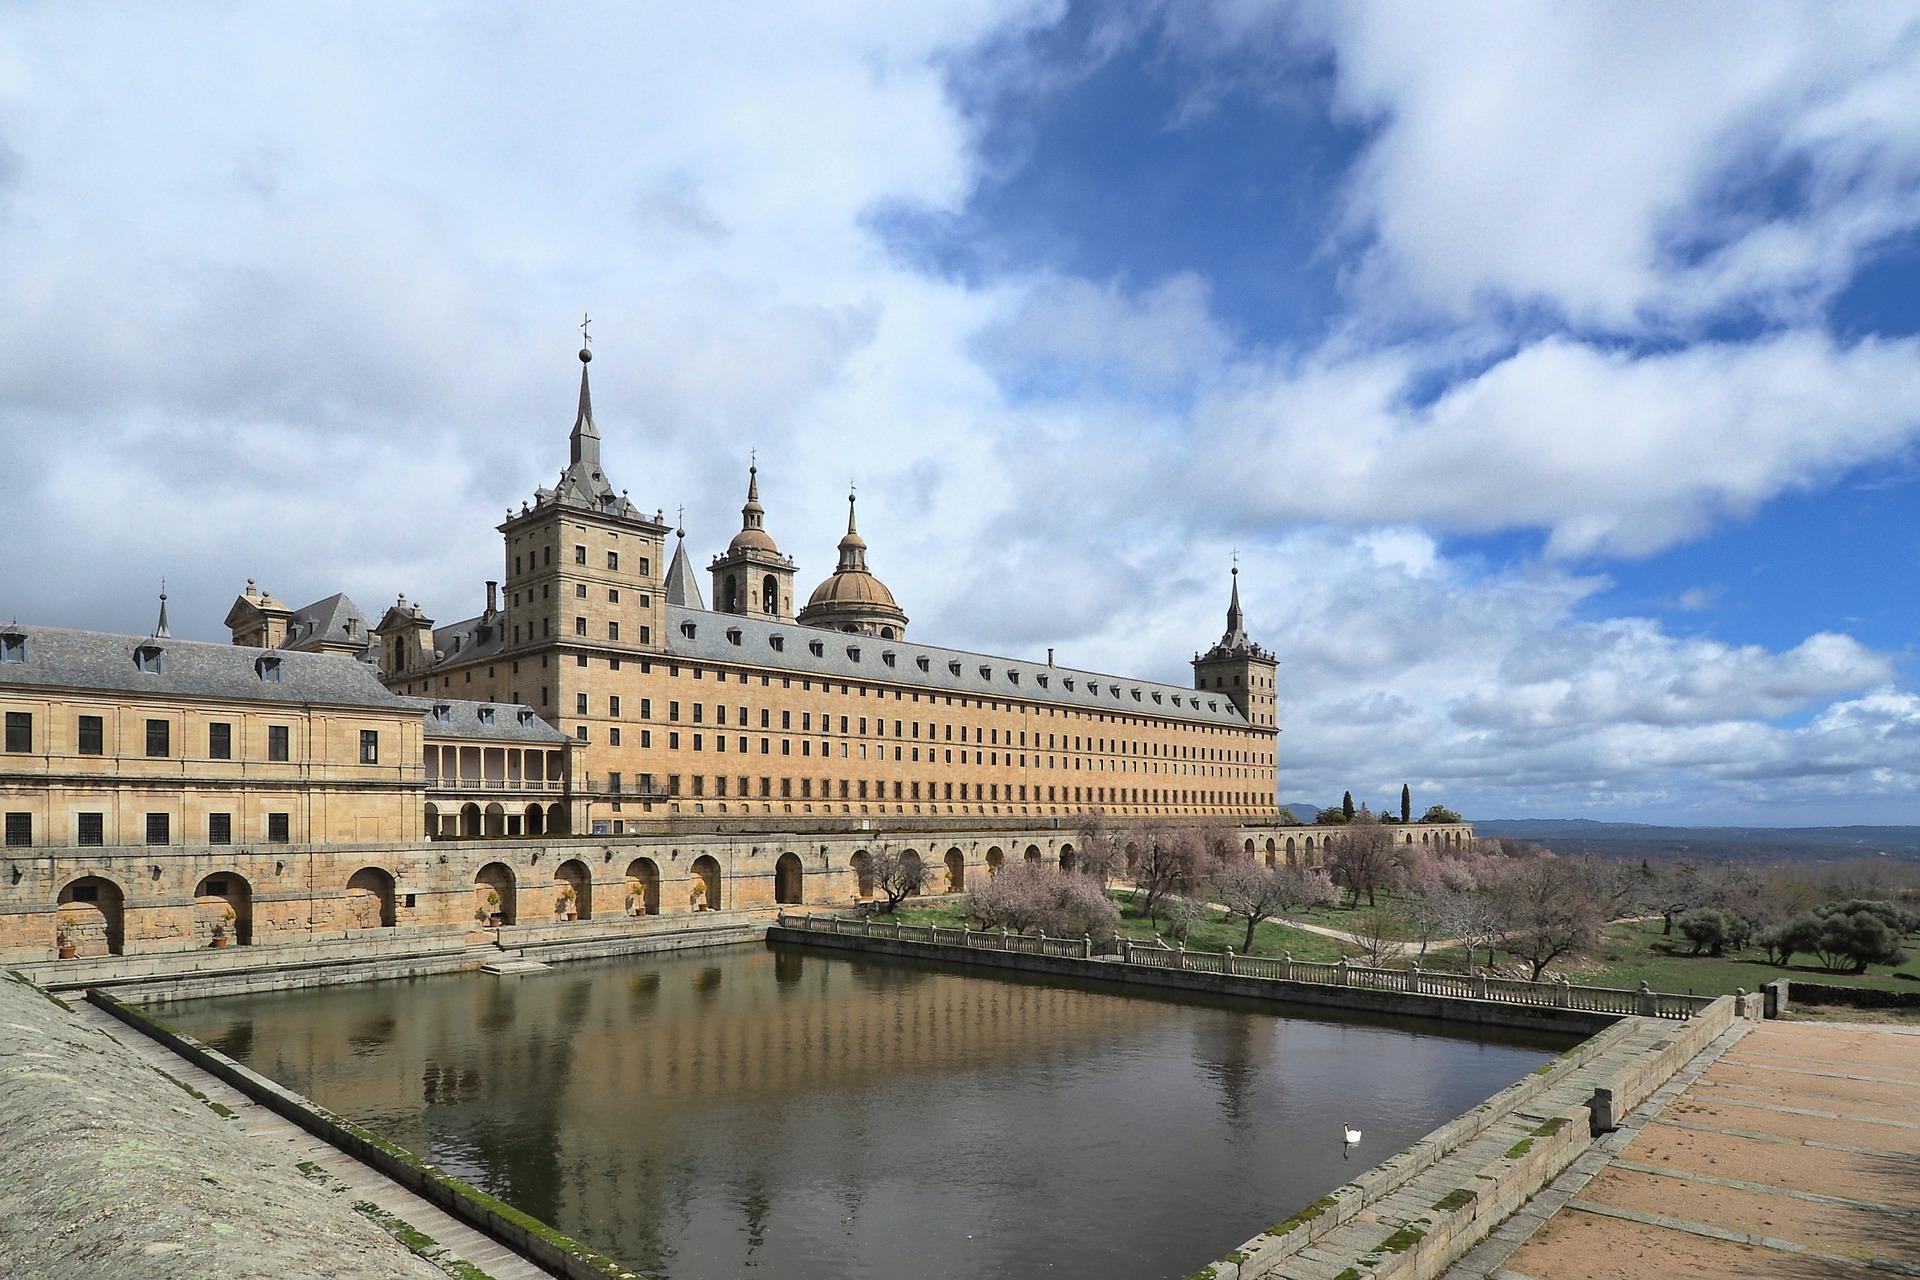 Tour Monastery of El Escorial